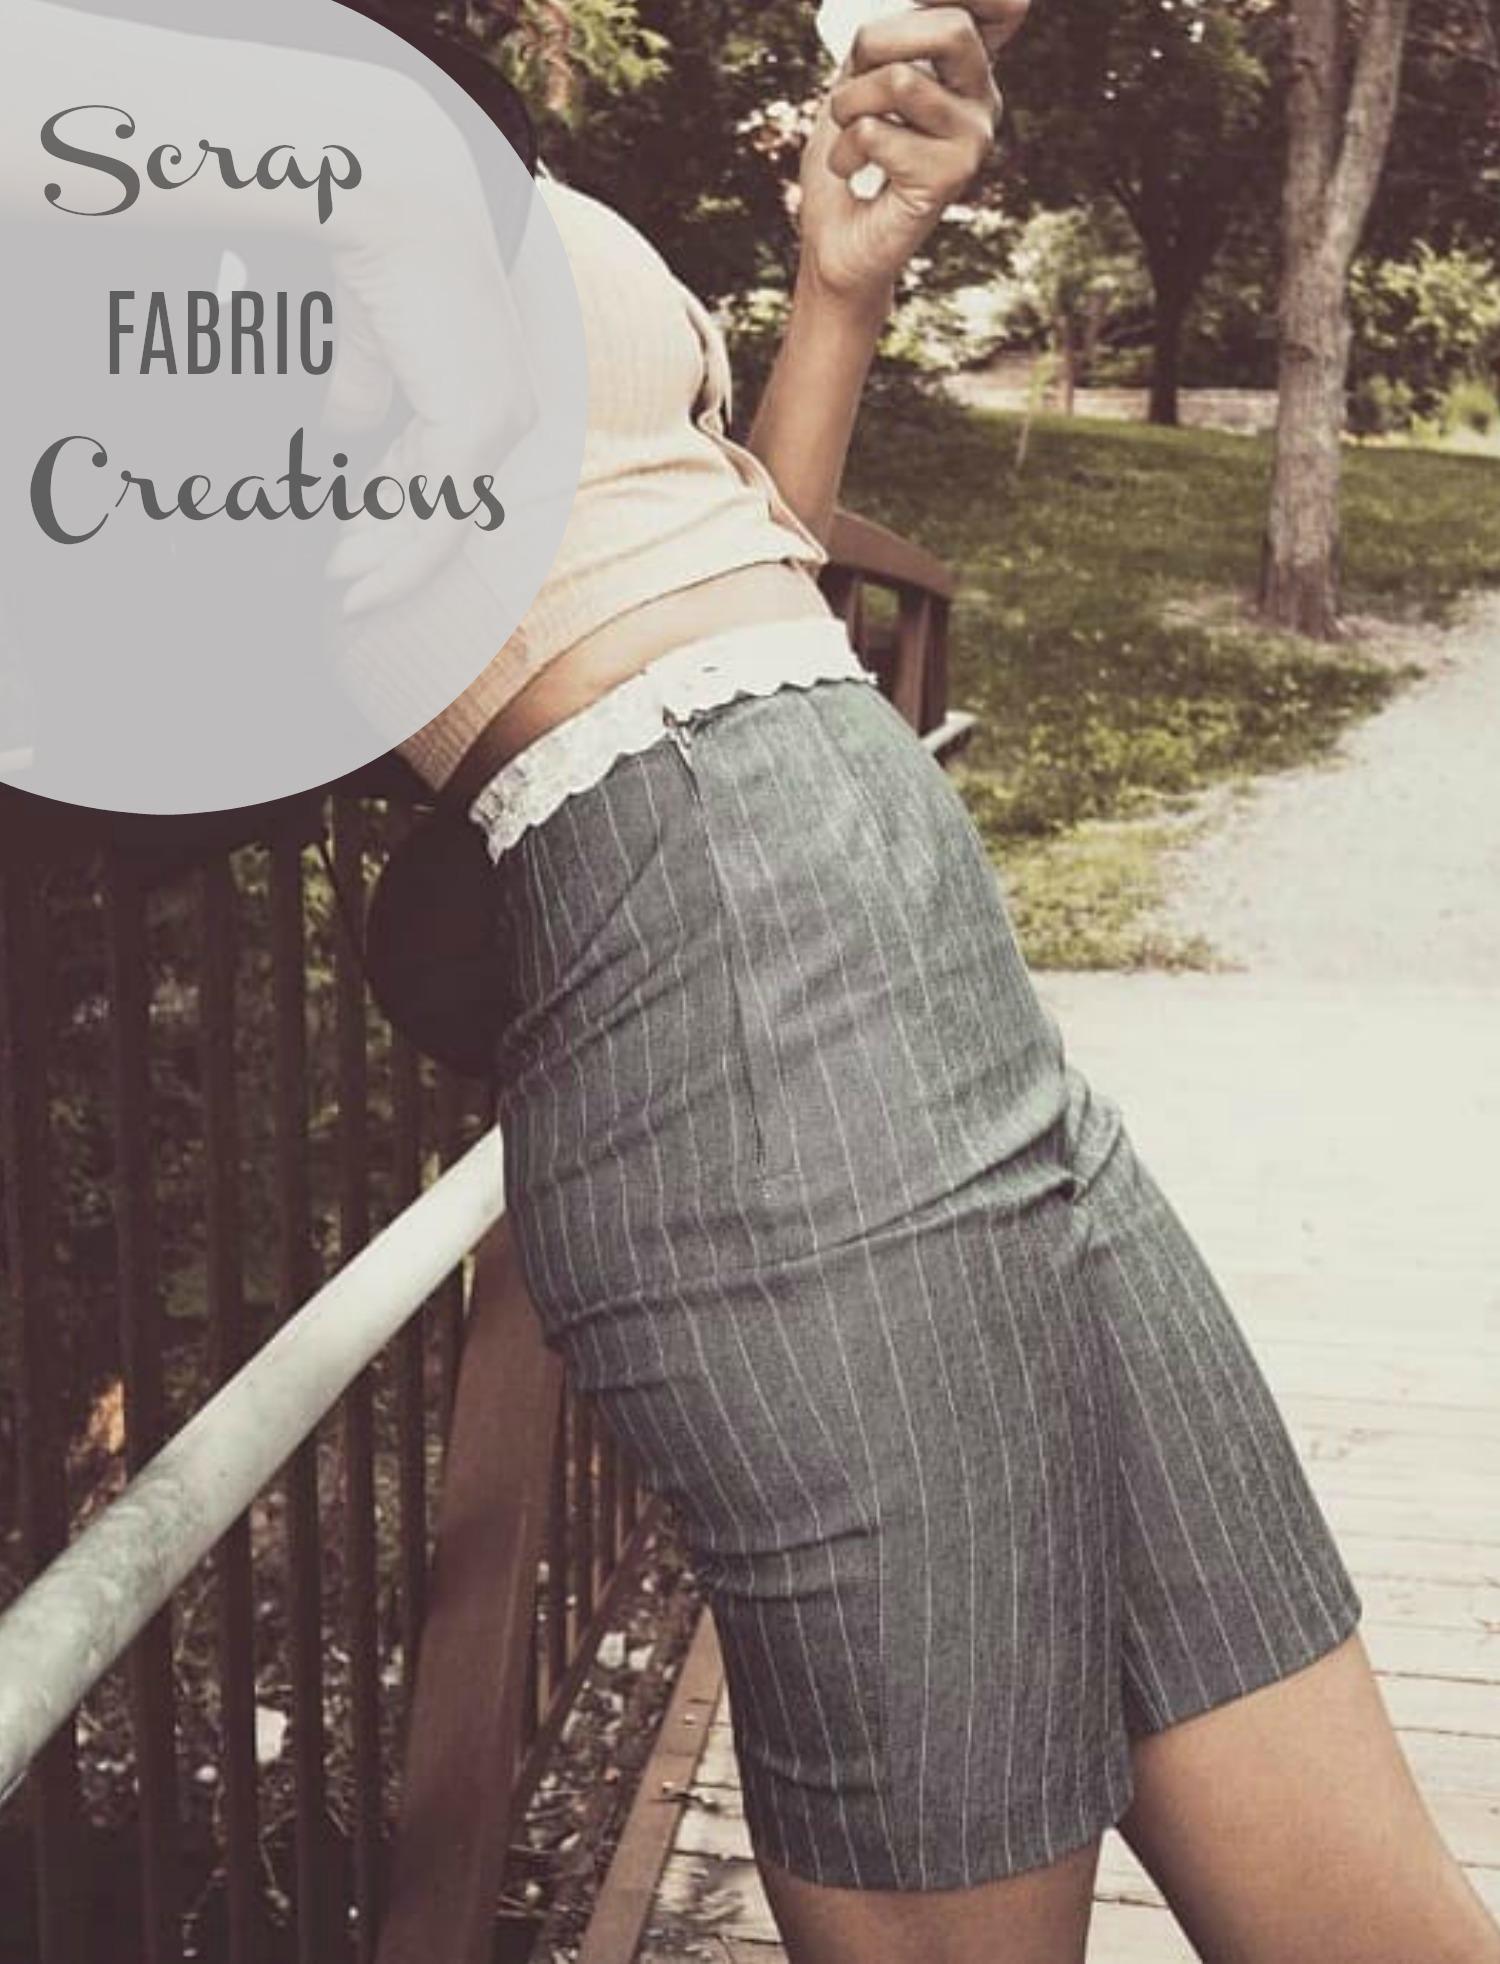 b-fabric-scrap-creations-profile-shorts.jpg